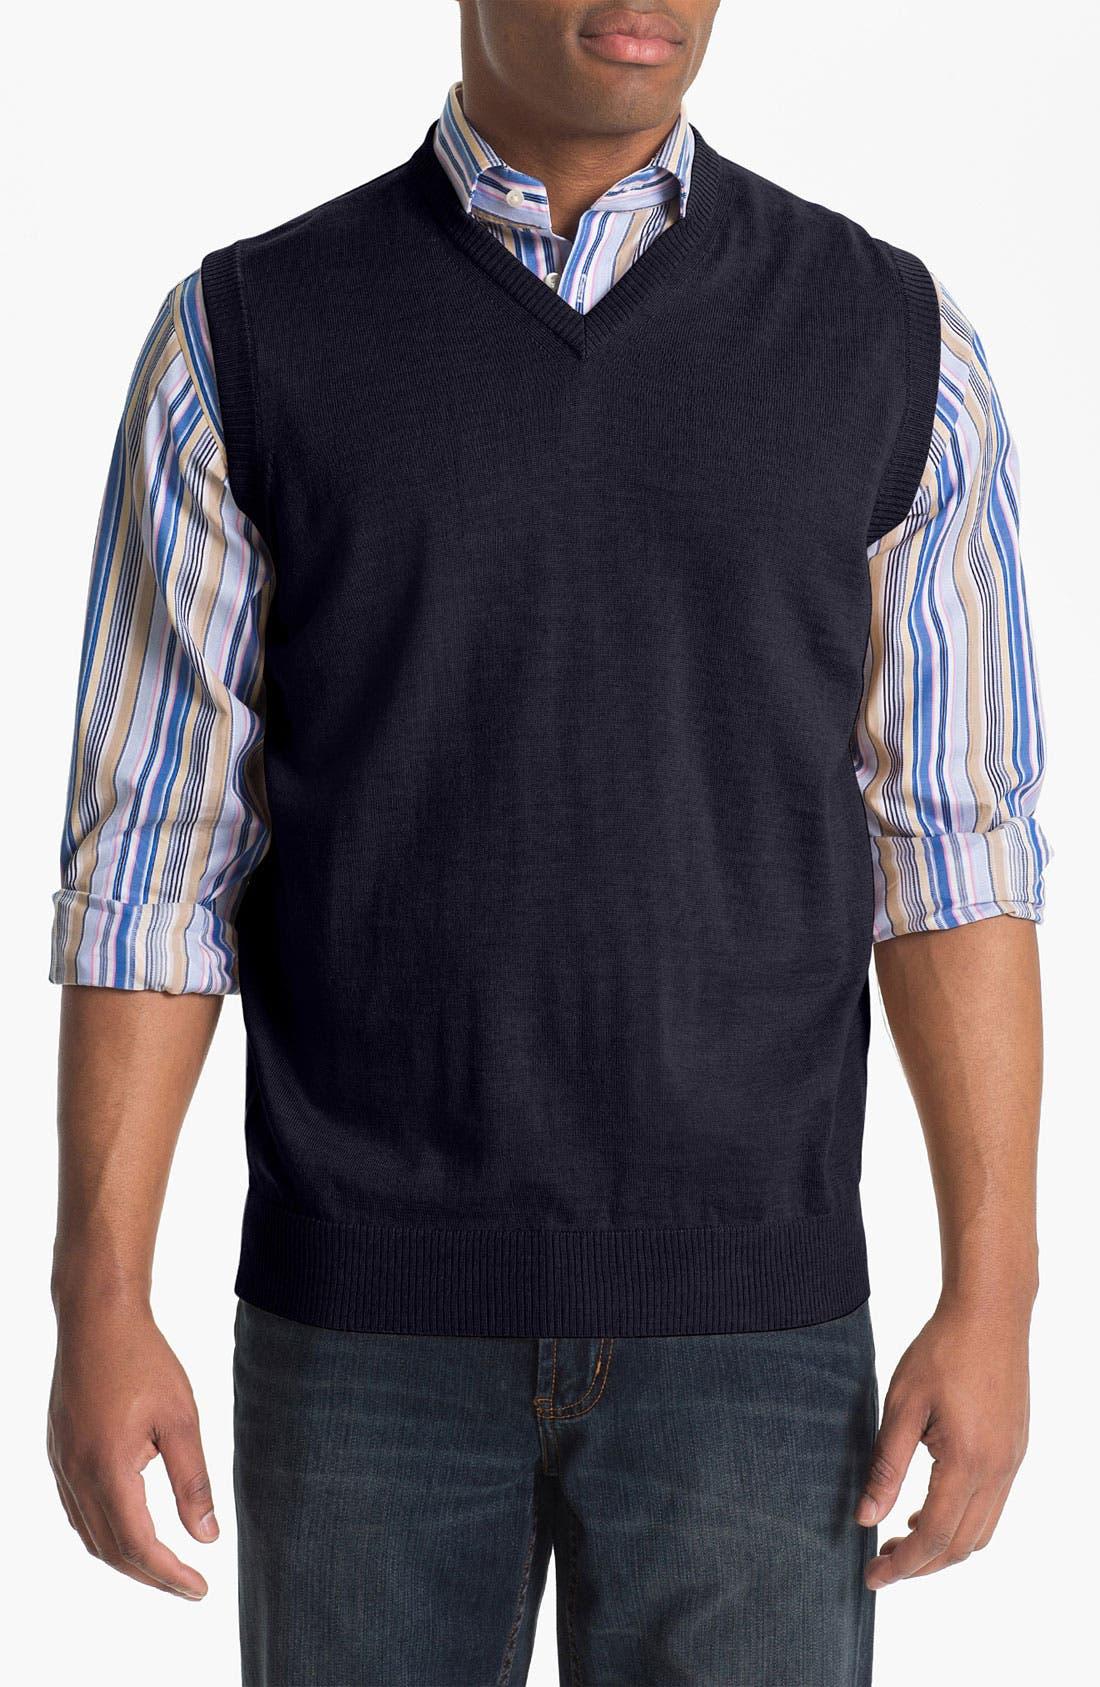 Alternate Image 1 Selected - Thomas Dean 'Baruffa' Merino Wool Sweater Vest